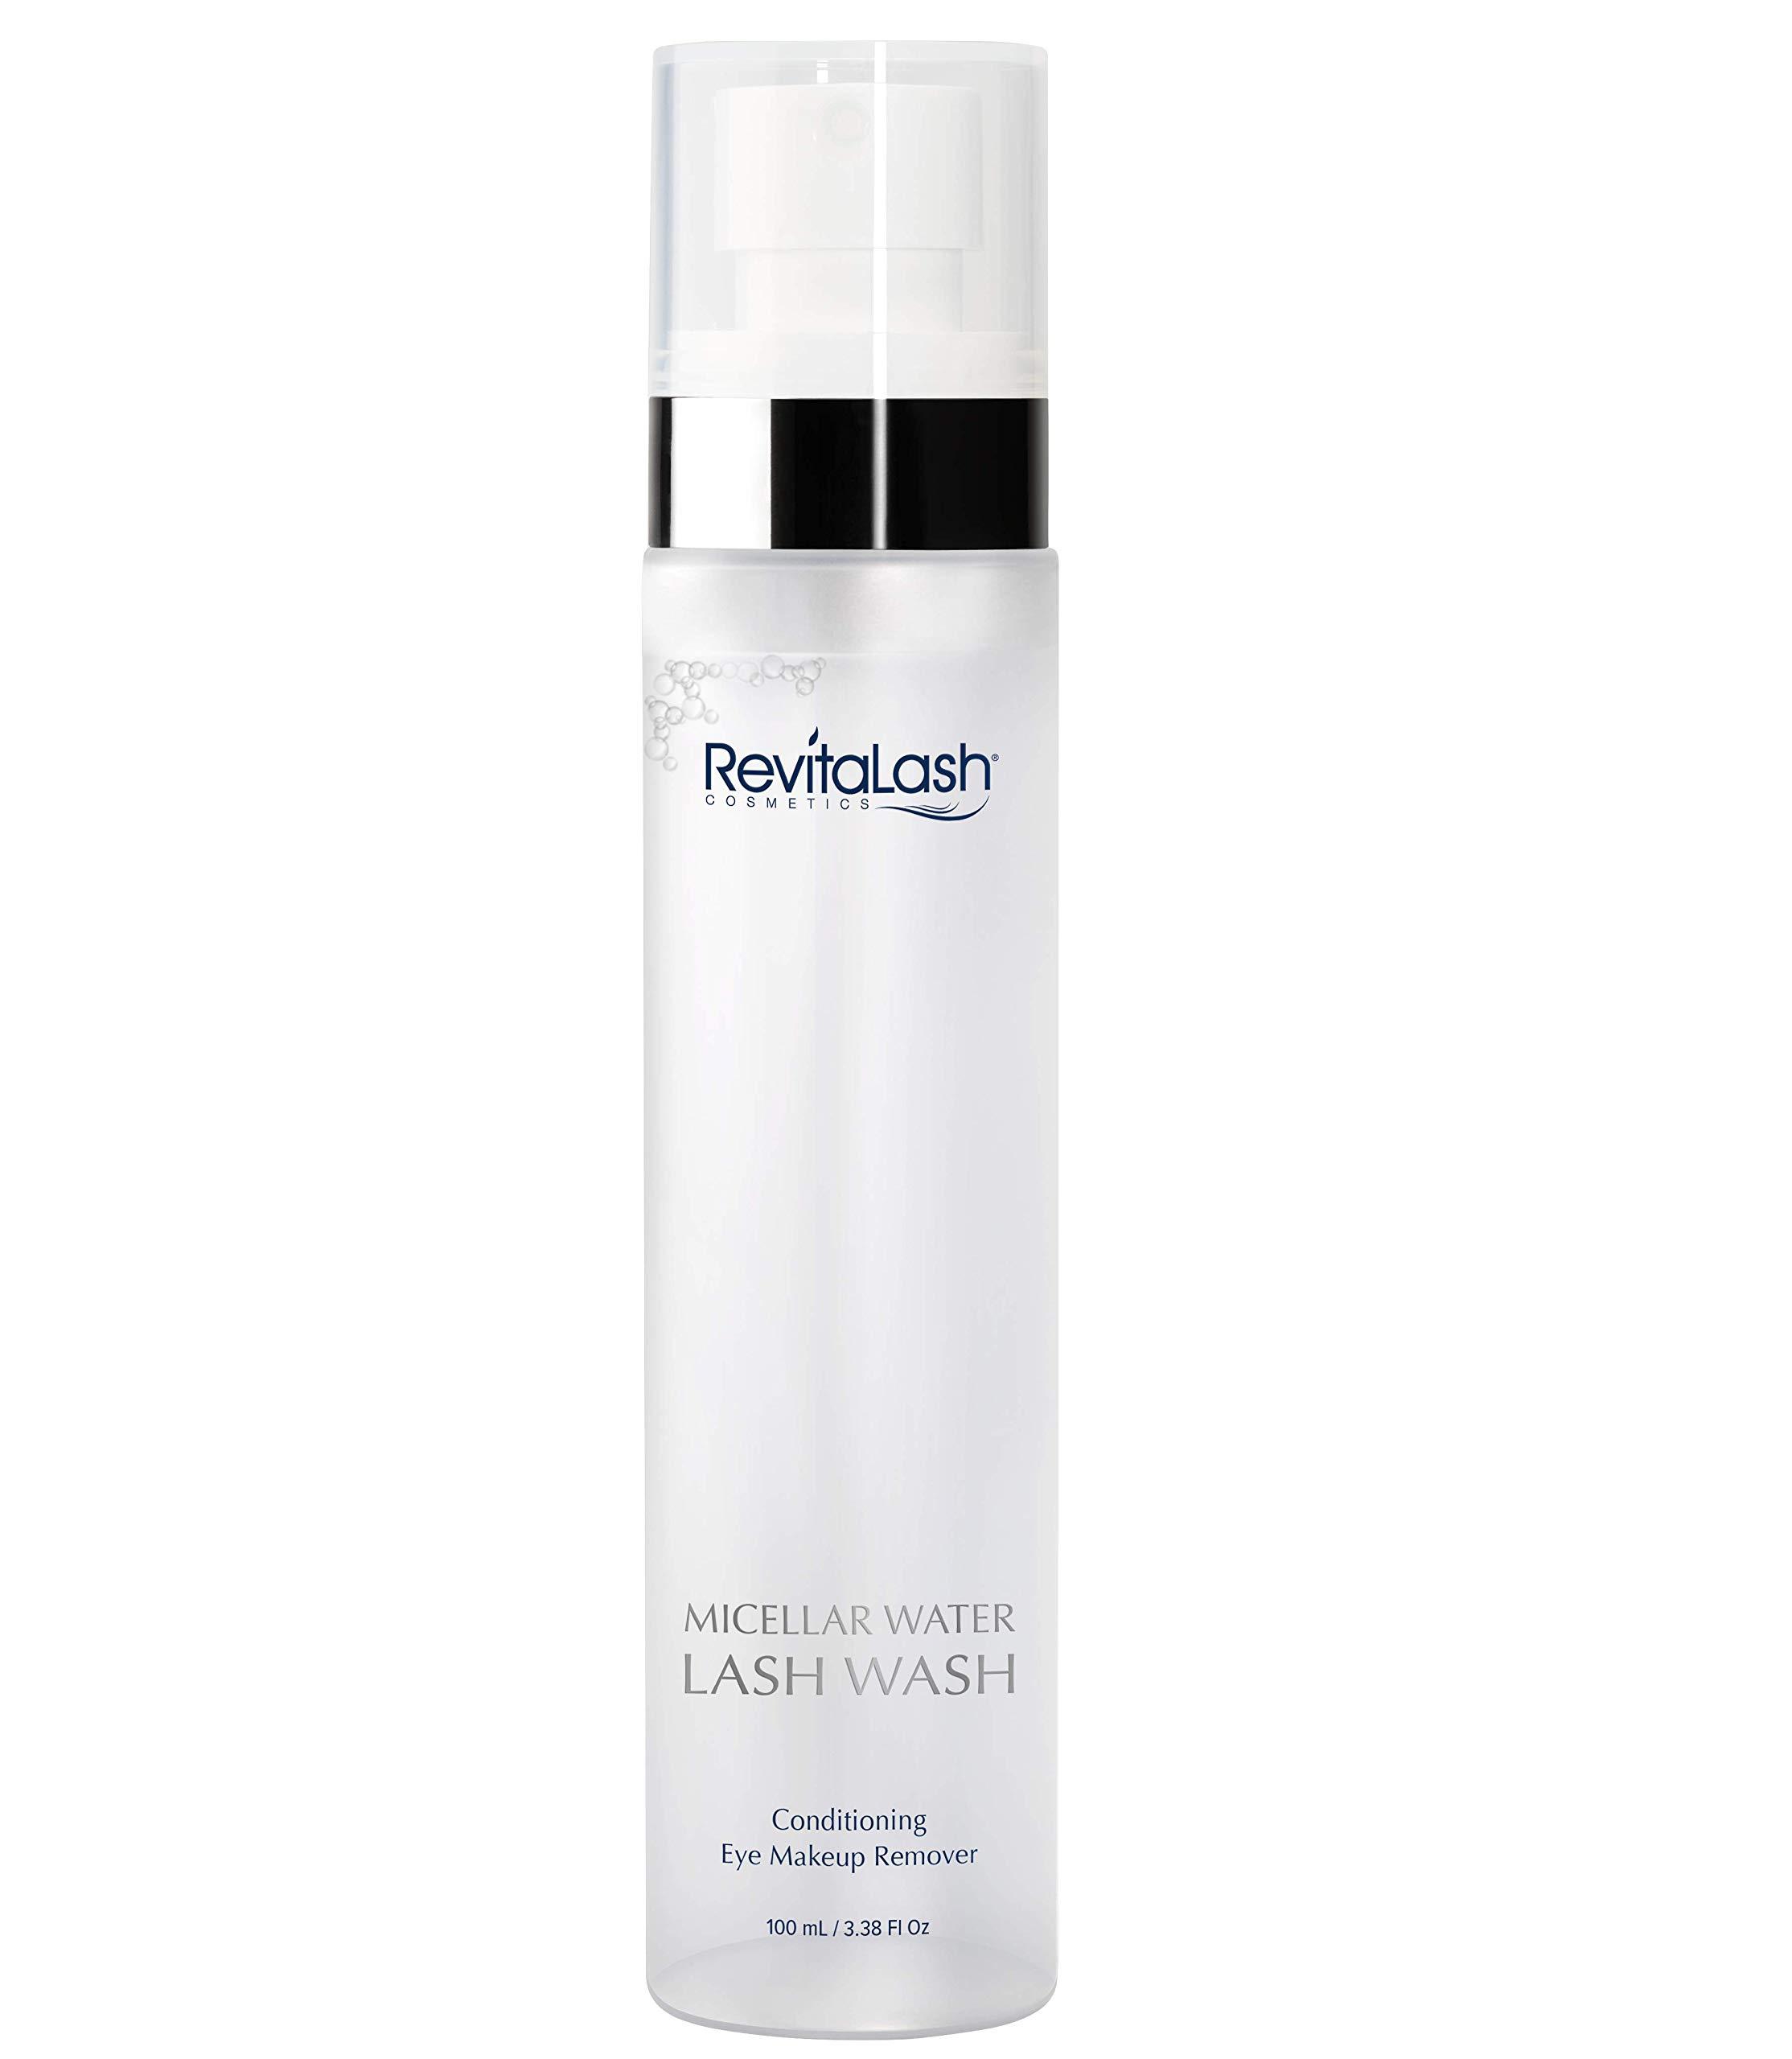 RevitaLash Cosmetics, Micellar Water Lash Wash - Conditioning Eye Makeup Remover, Hypoallergenic & Cruelty Free